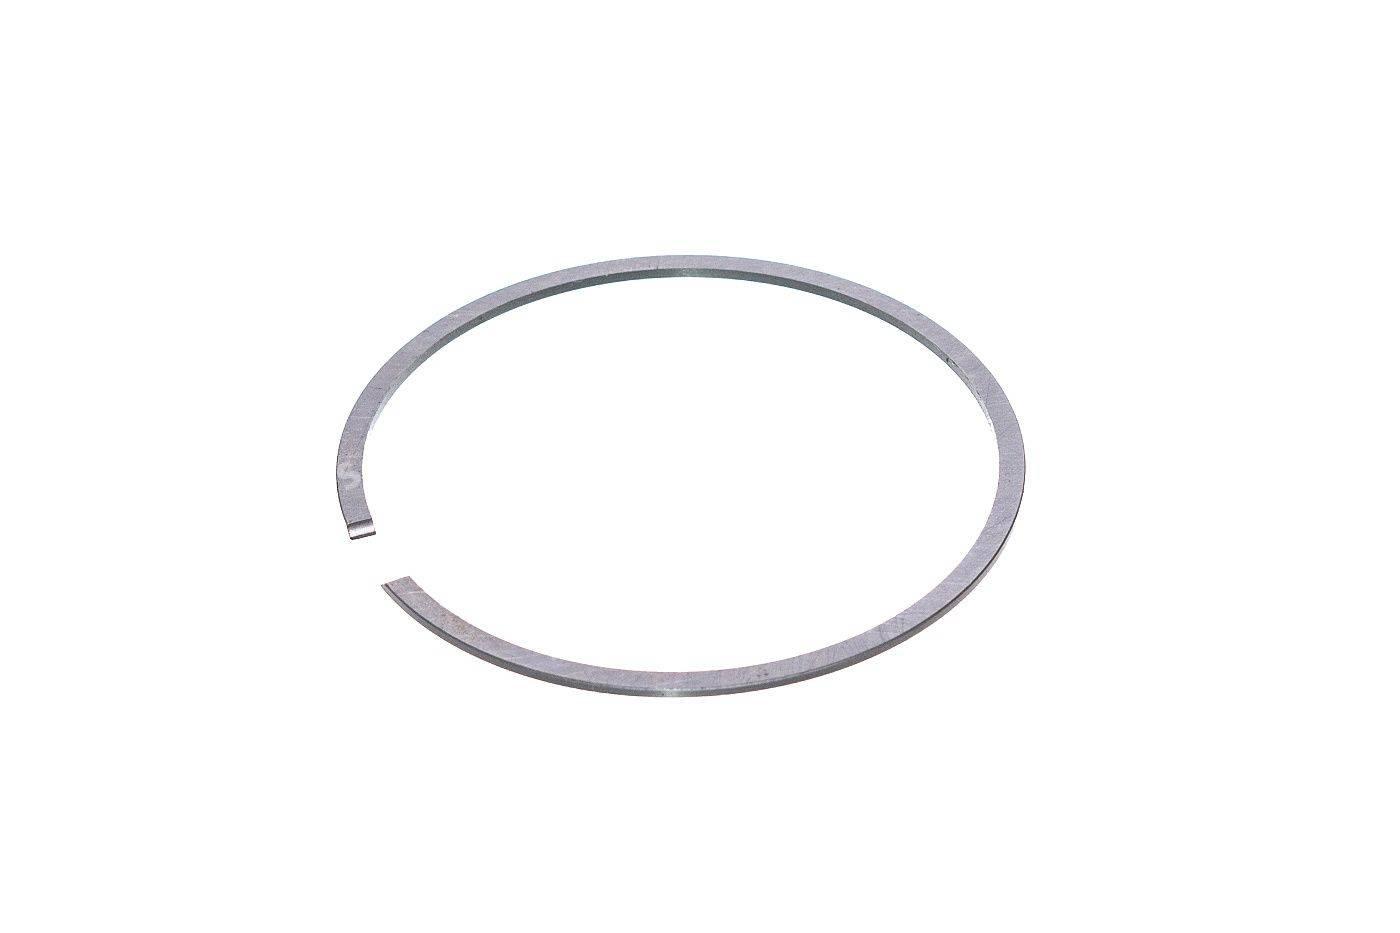 Pístní kroužek Caber 60 mm x 1,2 mm x 2,4 mm